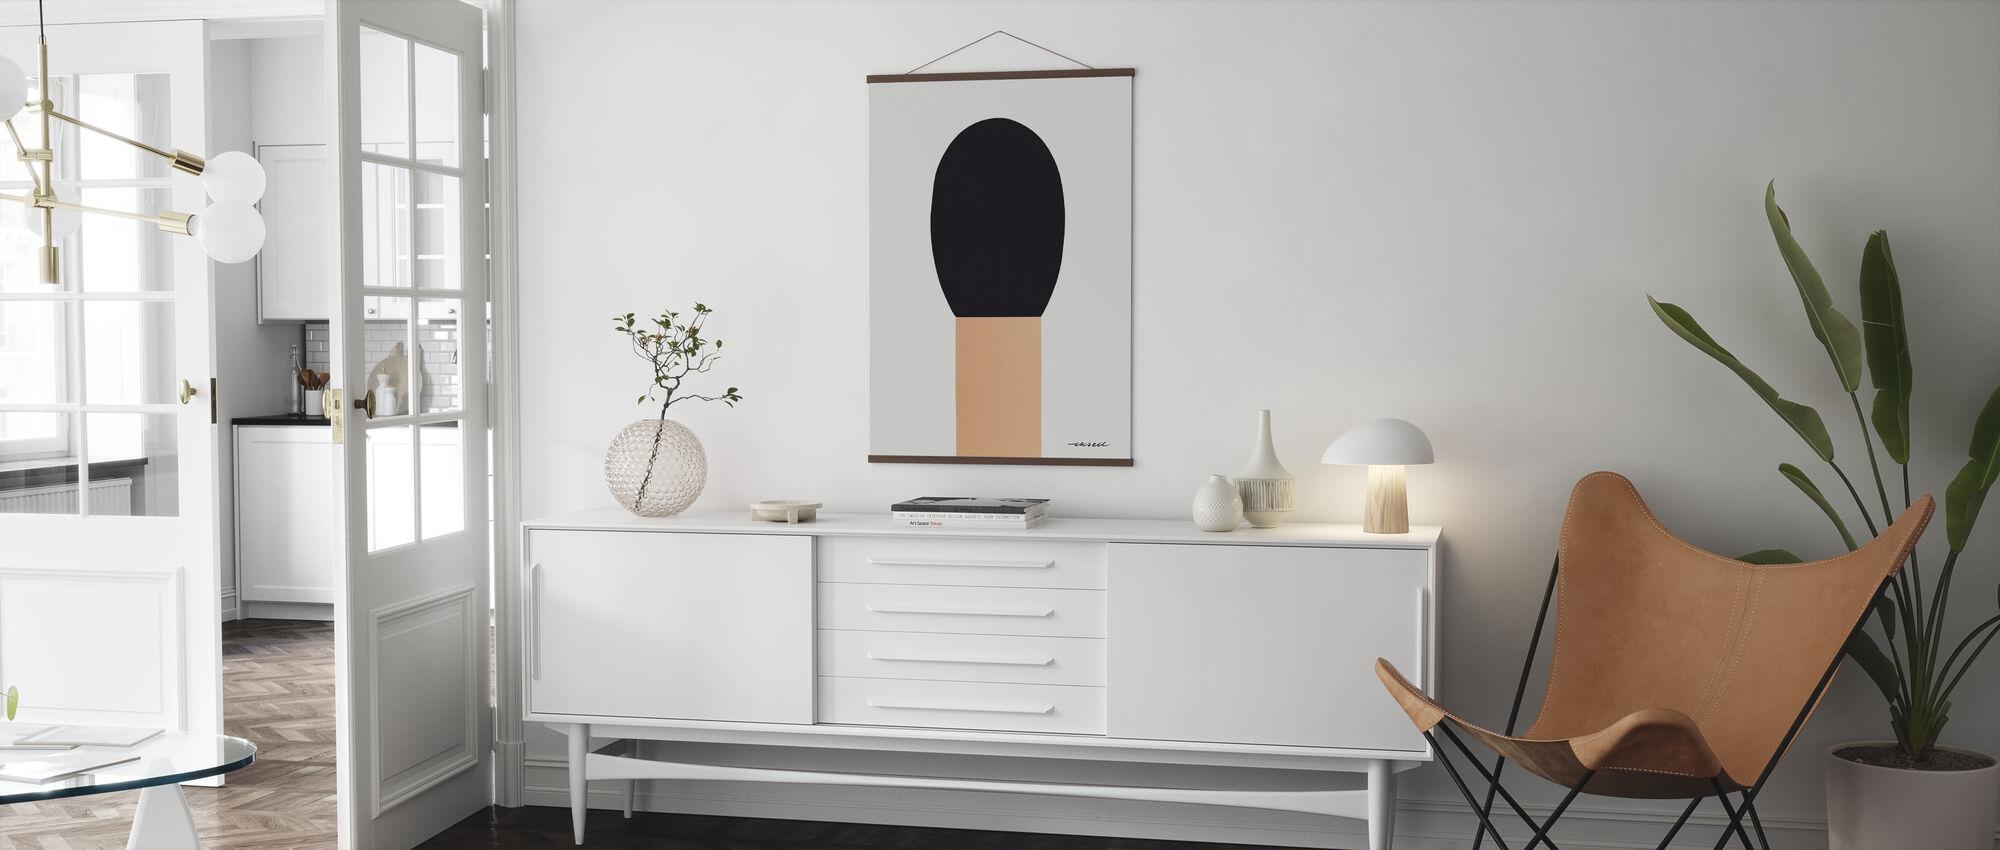 Wedstrijd - Poster - Woonkamer